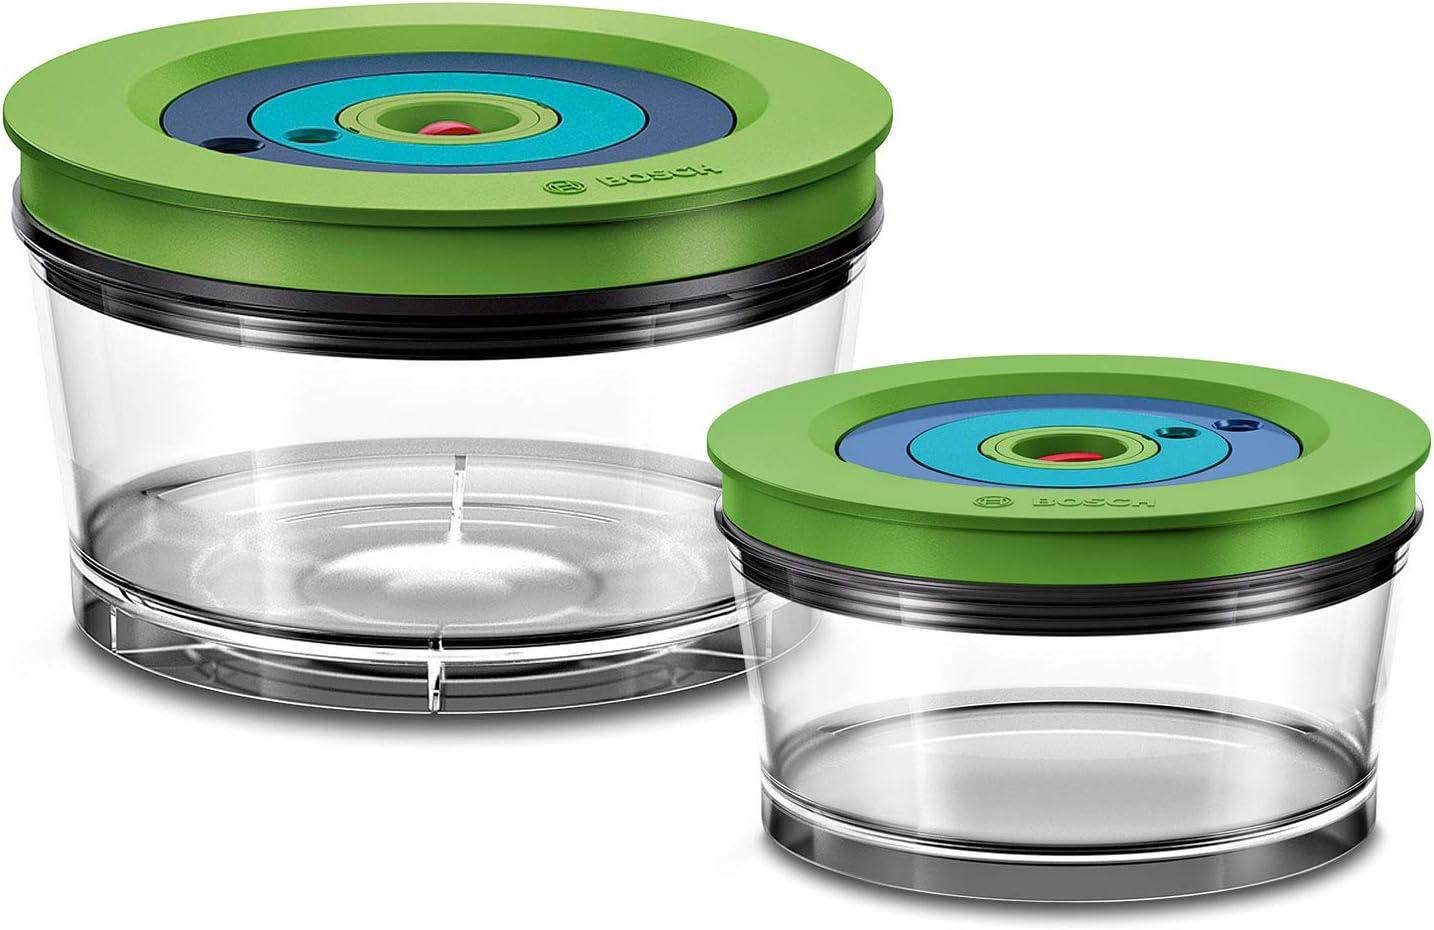 Bosch Hausgeräte Frischhaltedosen für den Vakuum-Standmixer Recipiente hermético para la batidora de vacío VitaMaxx, plástico, Transparente